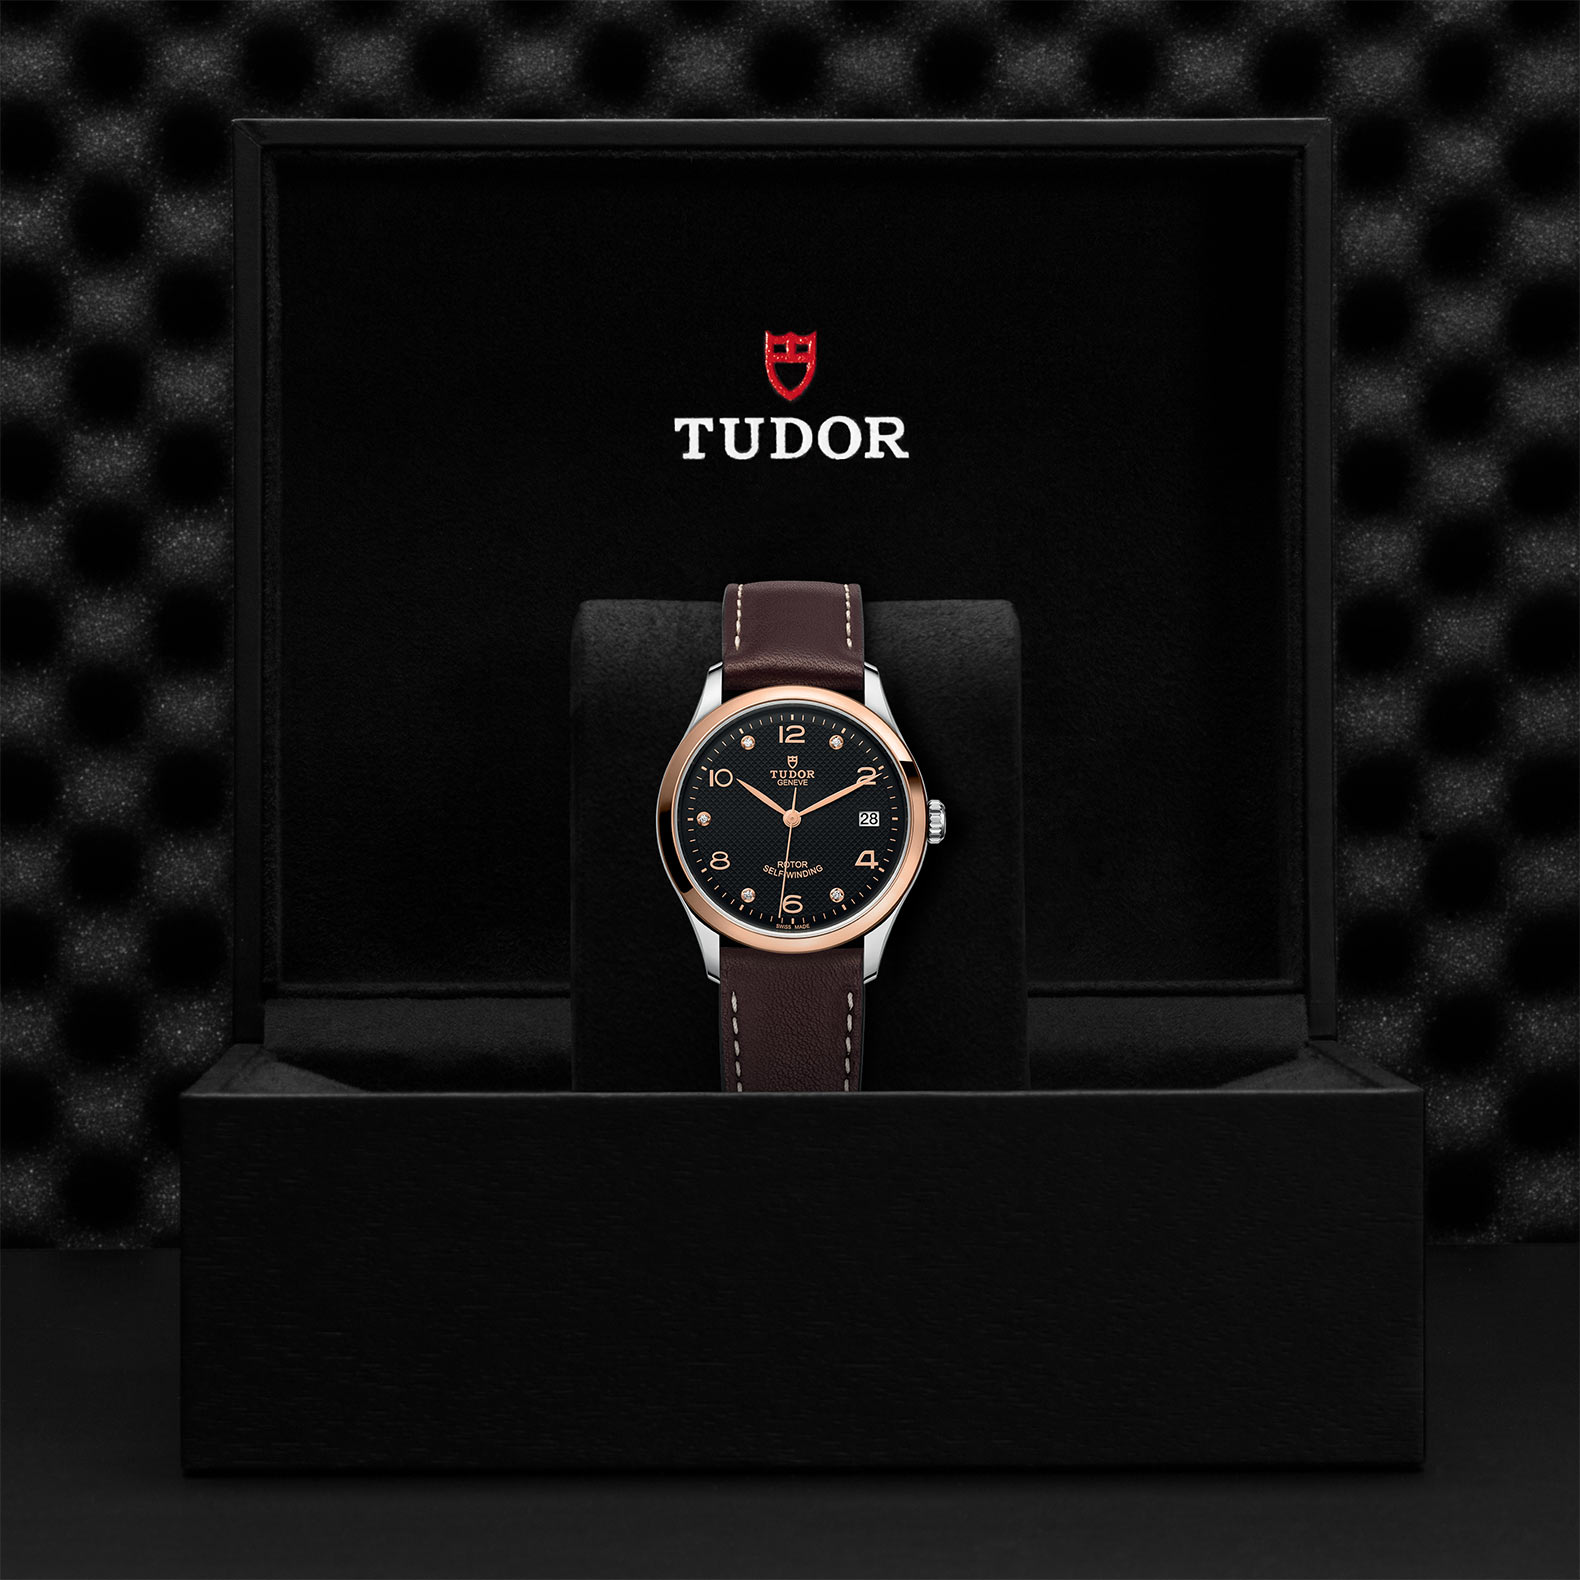 TUDOR 1926 - M91451-0008